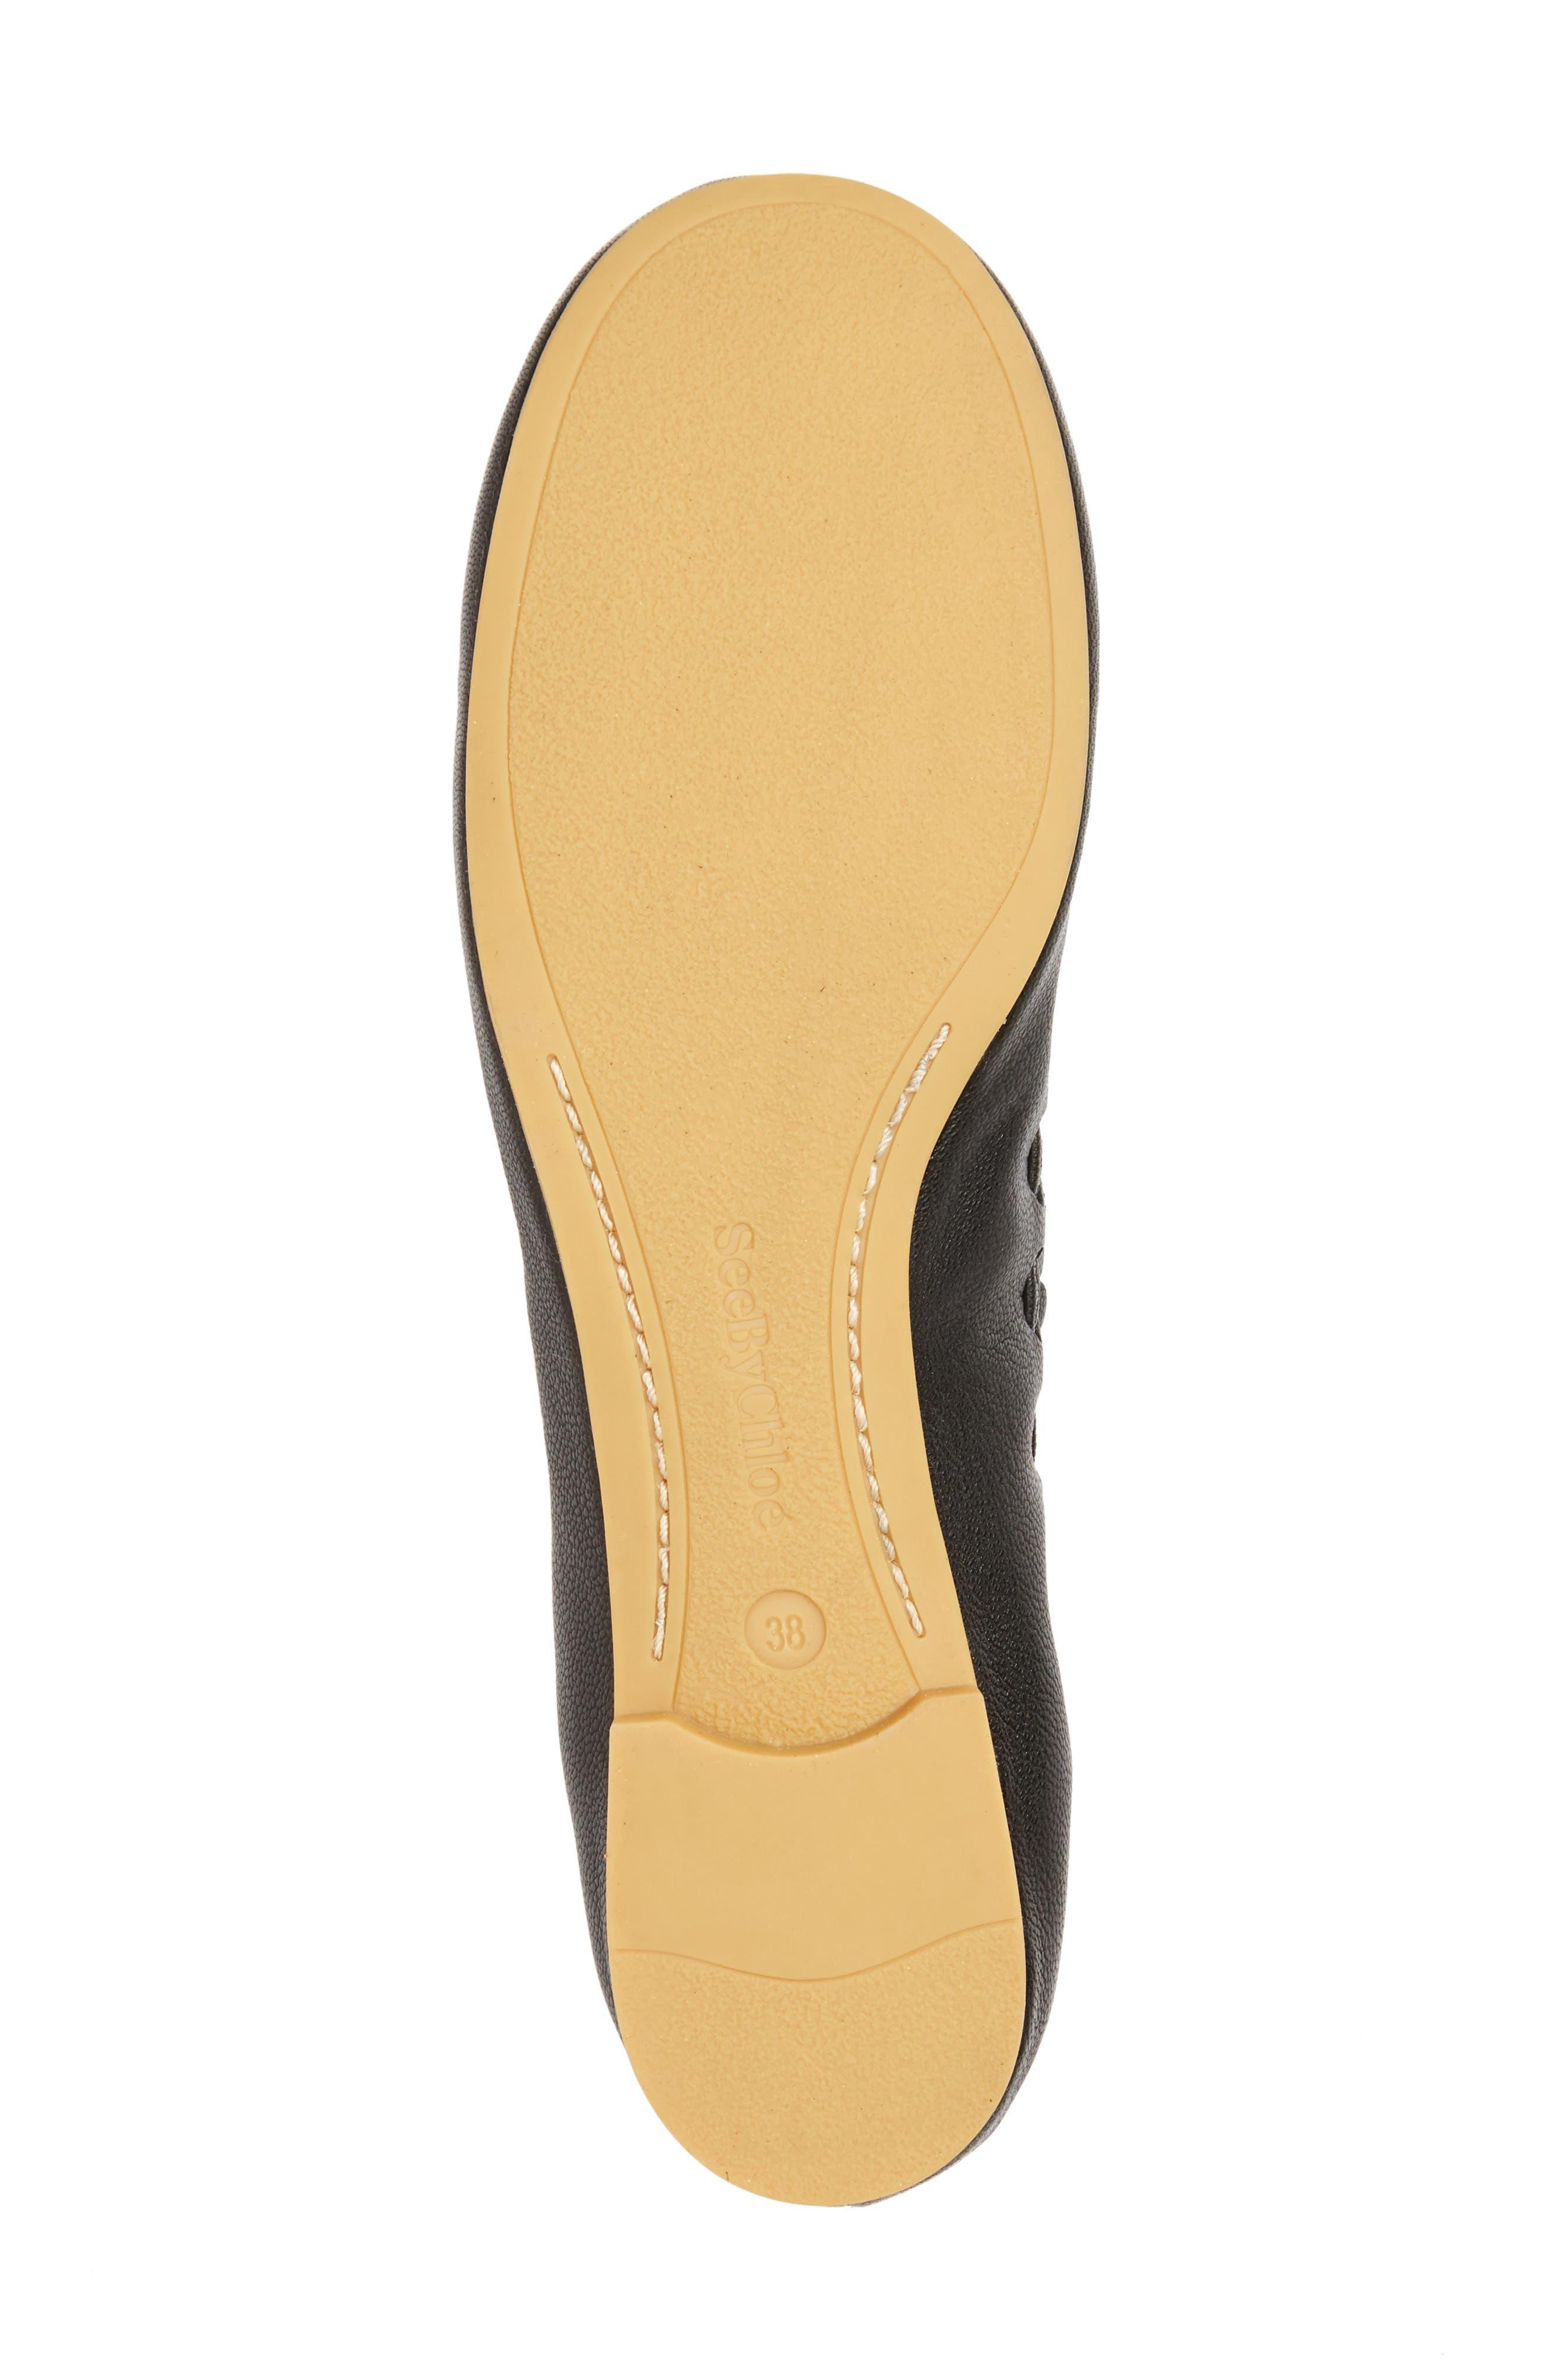 'Jane' Ballerina Flat,                             Alternate thumbnail 6, color,                             Black/ Goat Leather